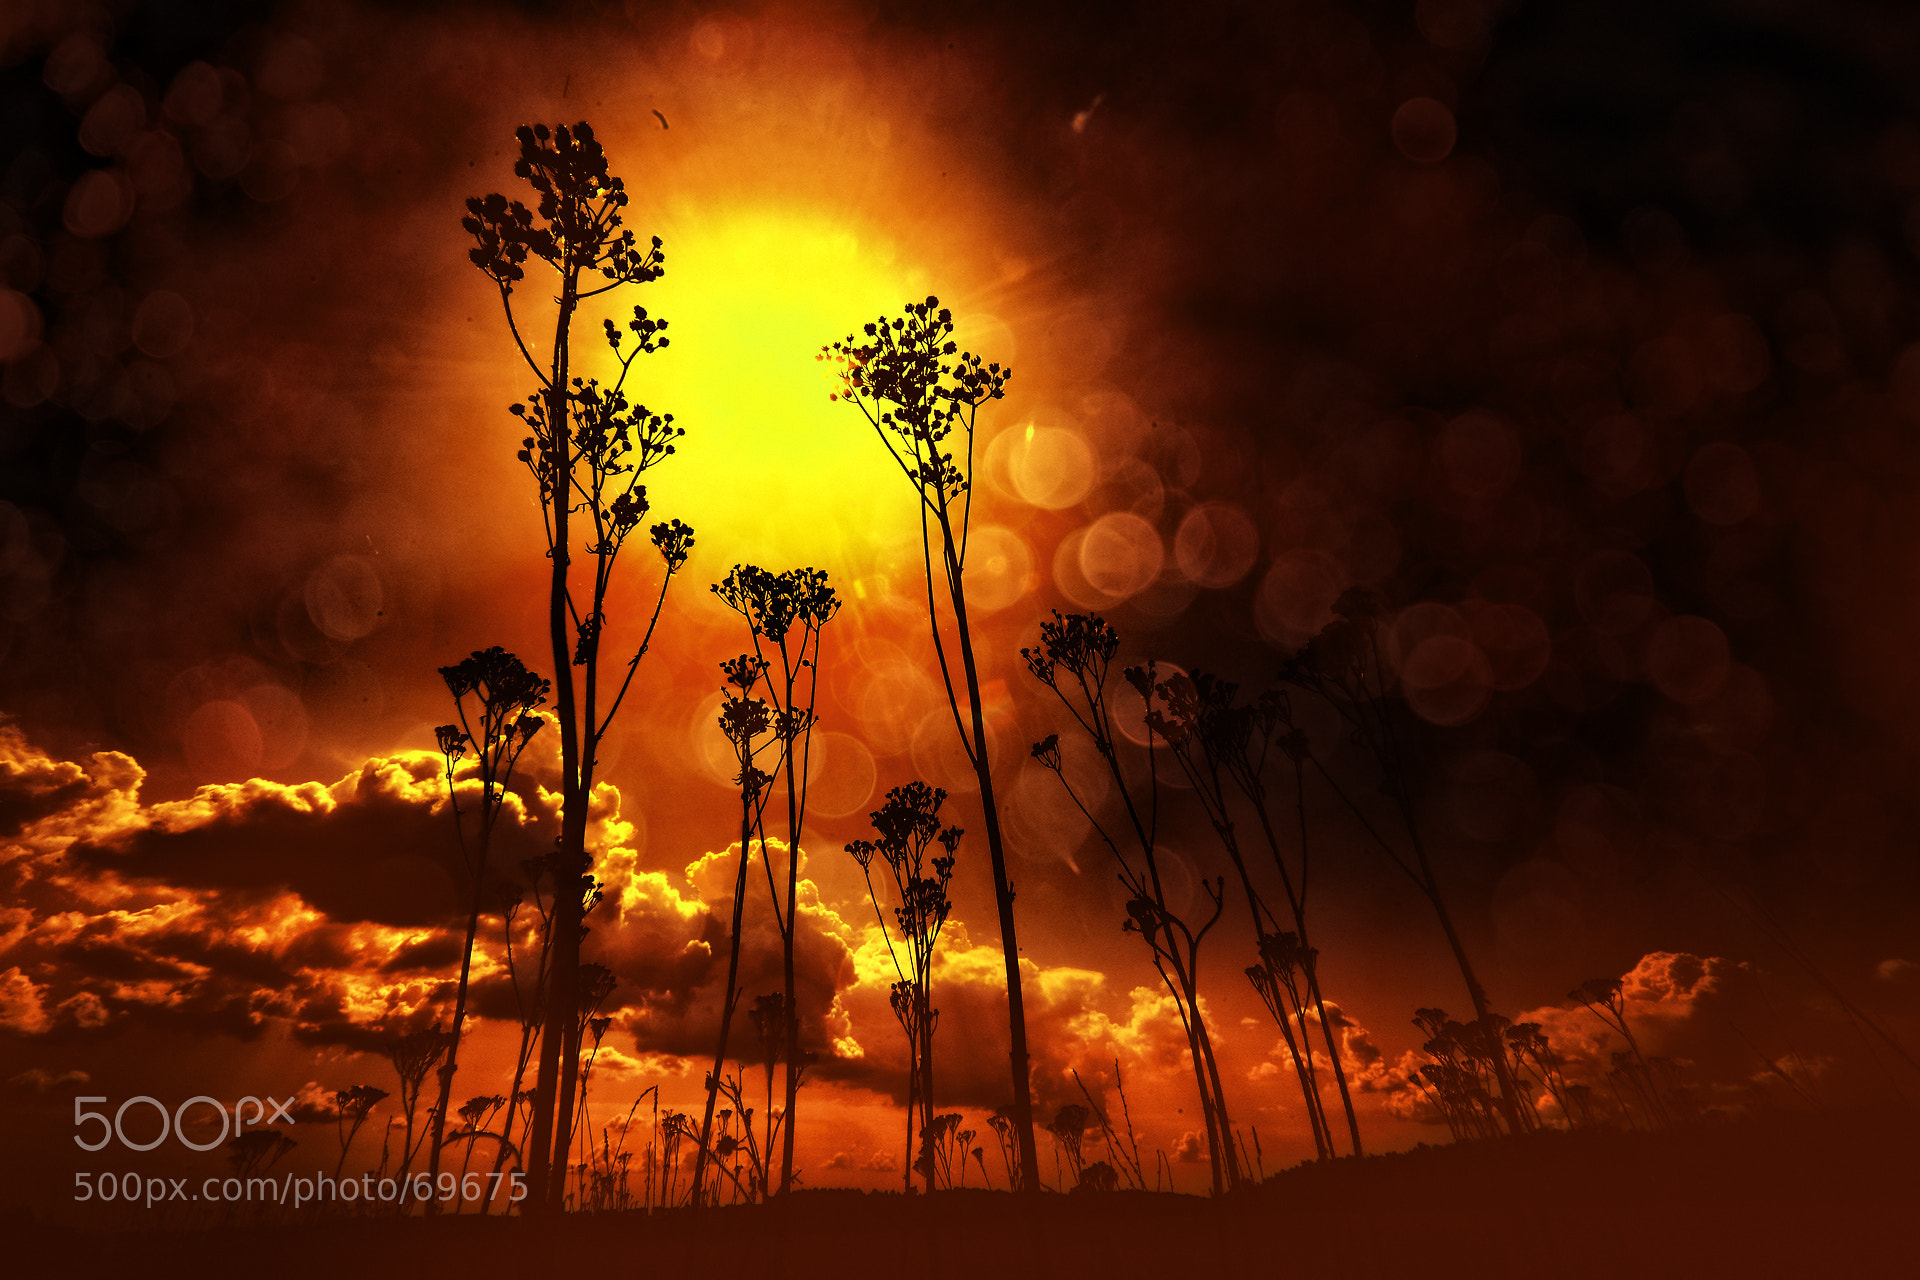 Photograph Spectrum - Red (new world) by Sergey Smolenko on 500px